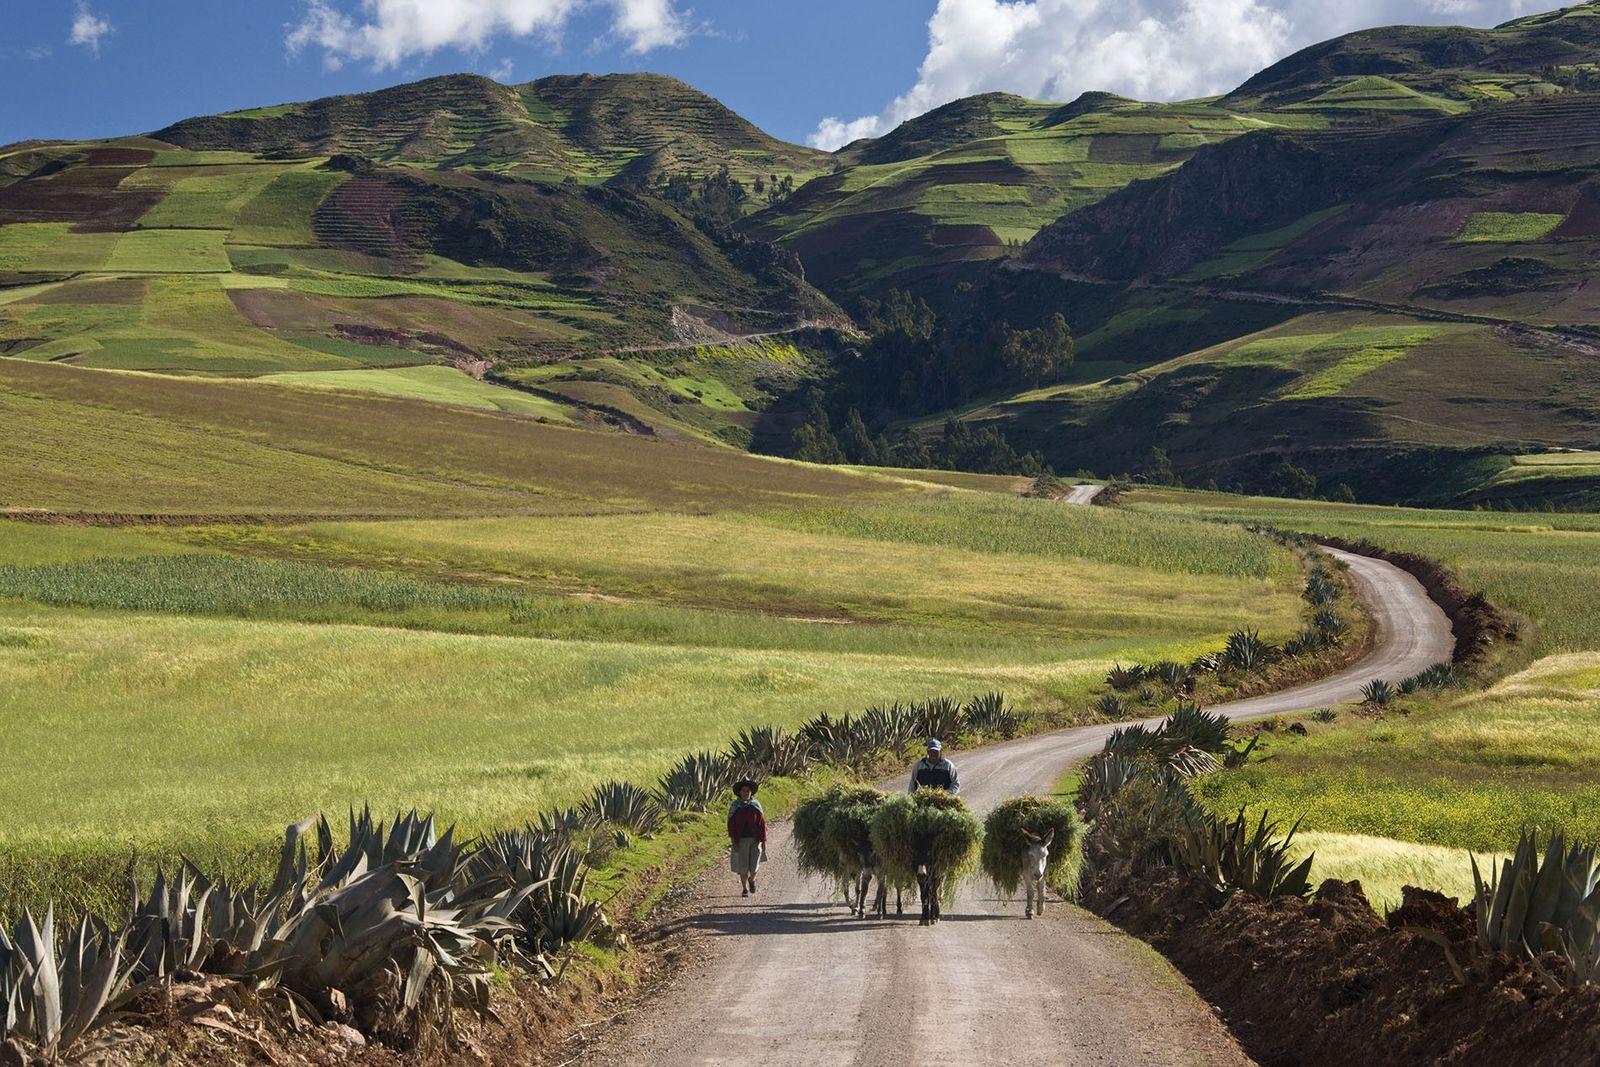 Done the Inca Trail? Try Peru's Lares trek